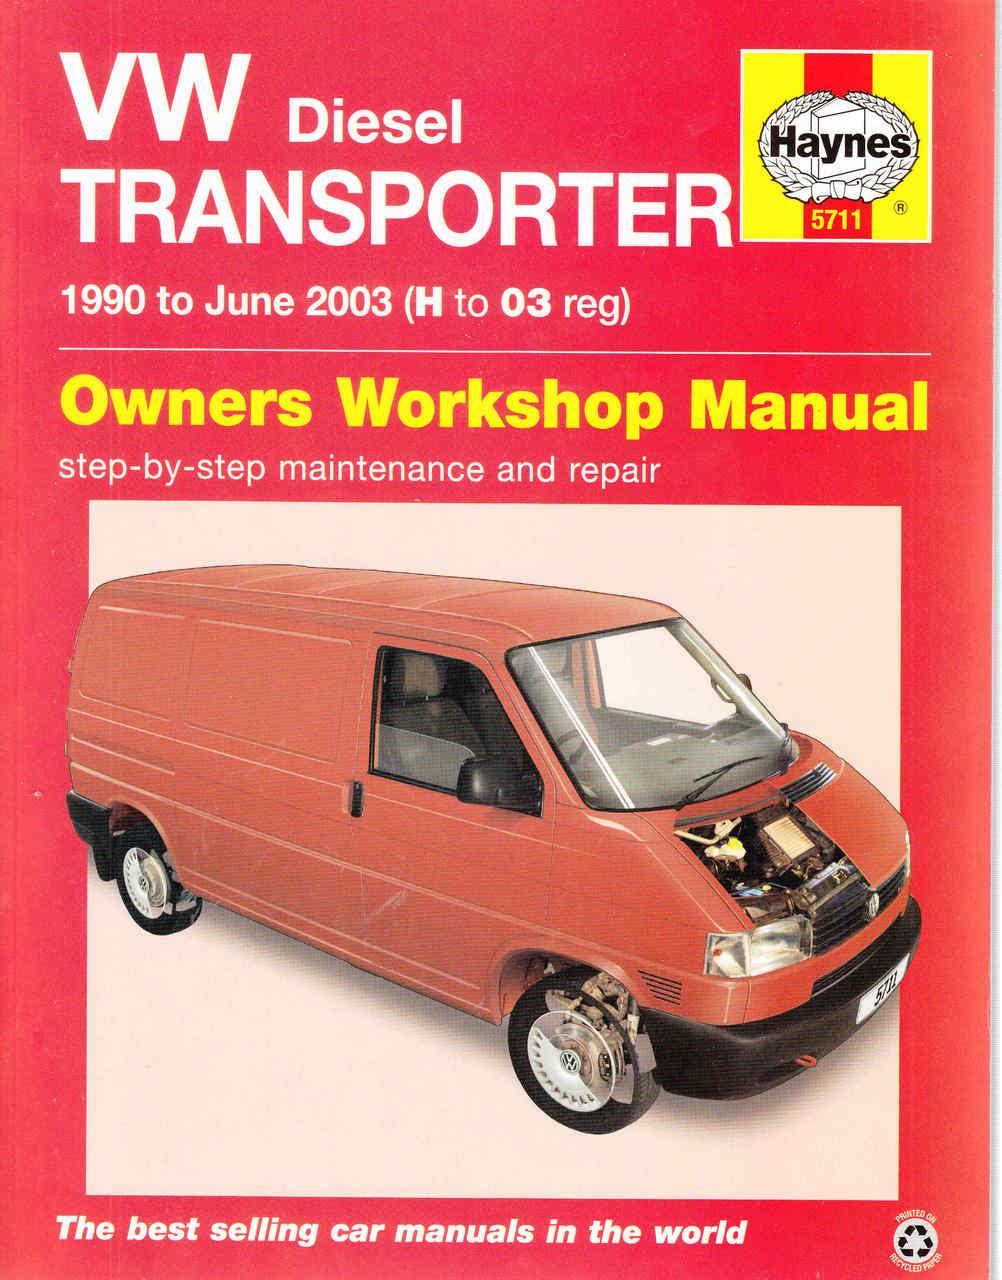 vw transporter t4 1990 to 2003 diesel workshop manual rh automotobookshop com au vw transporter t3 service manual pdf volkswagen transporter t3 repair manual